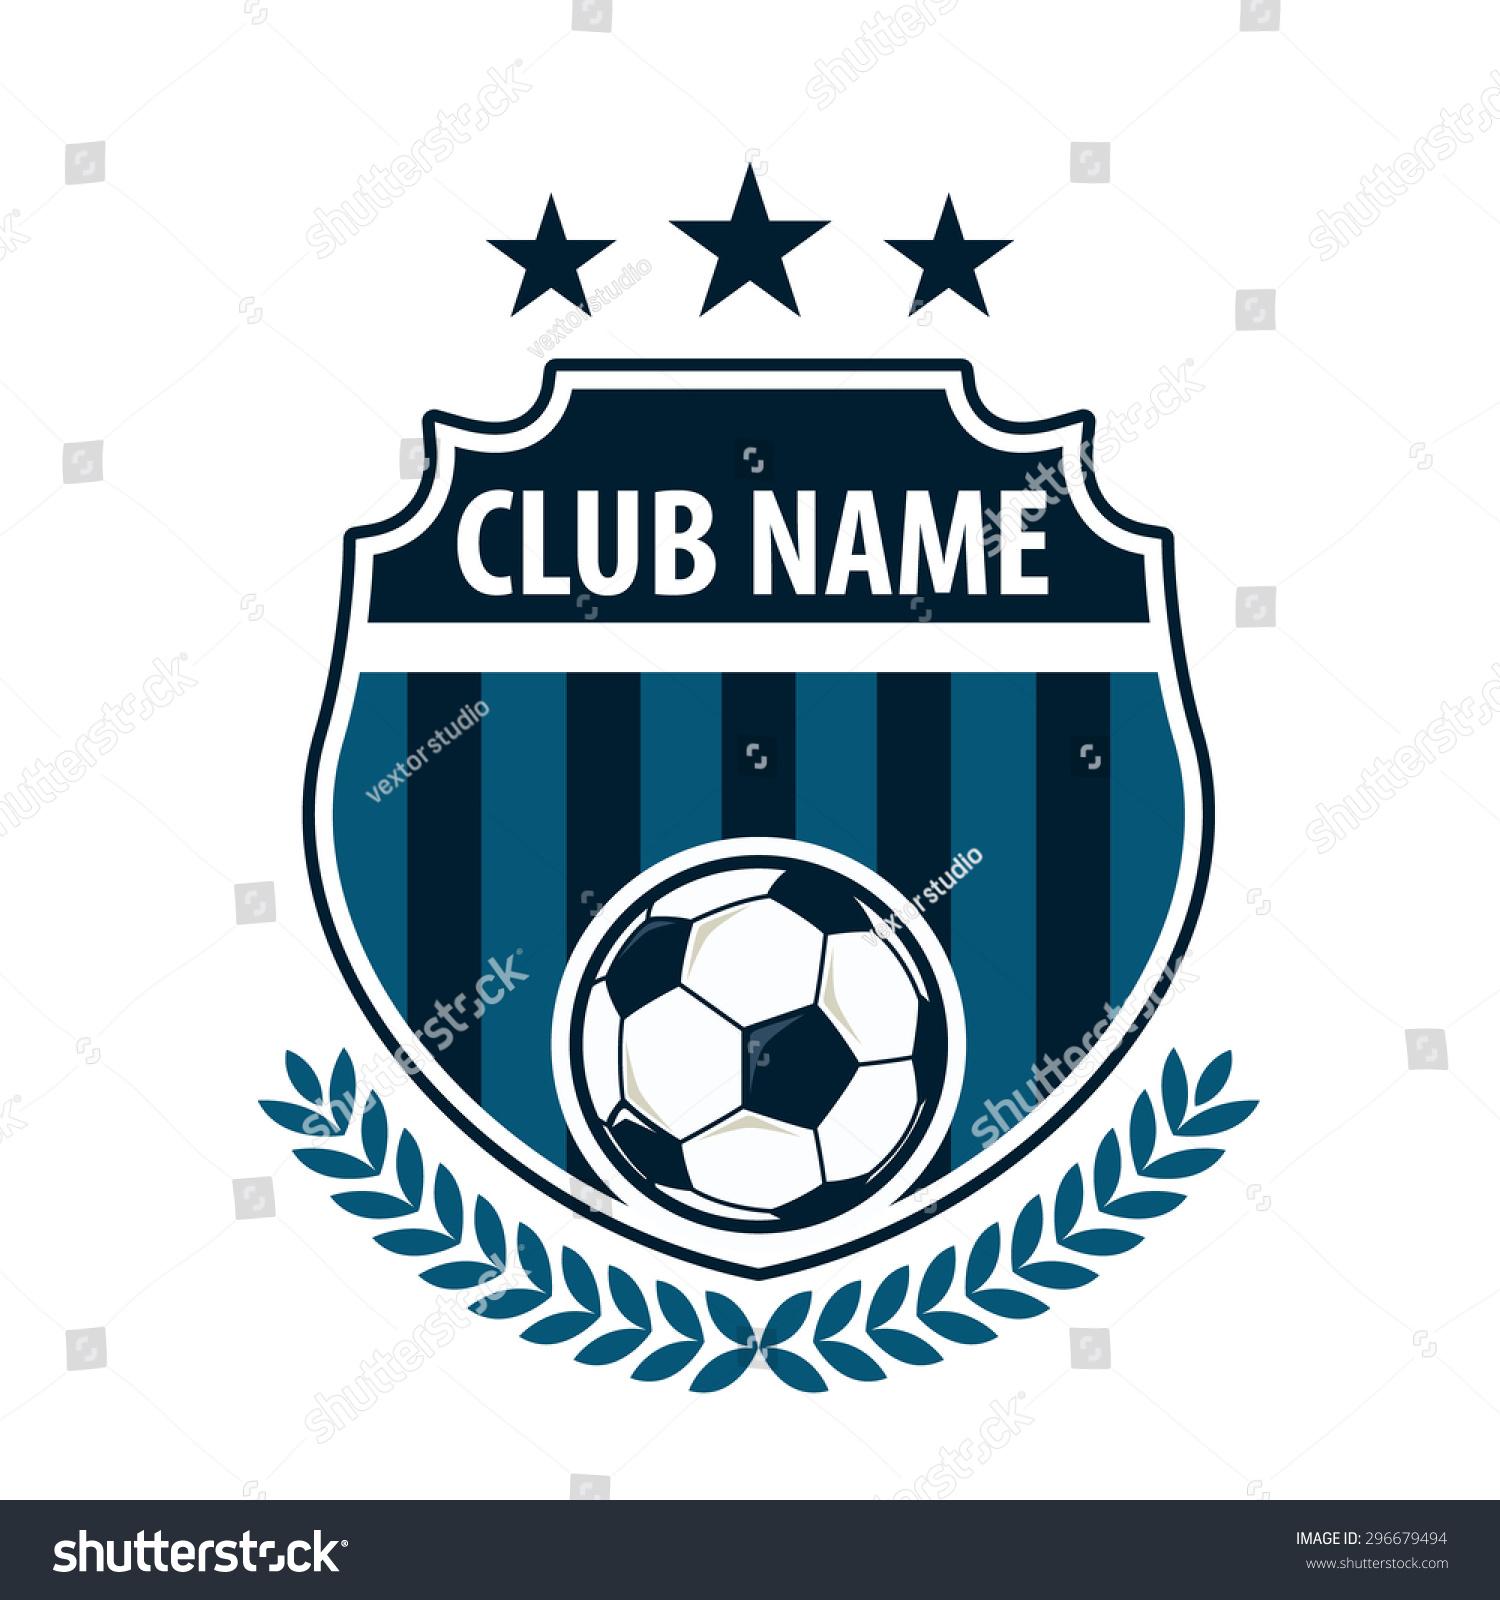 Football Badge Logo Template Designsoccer Teamvector Stock